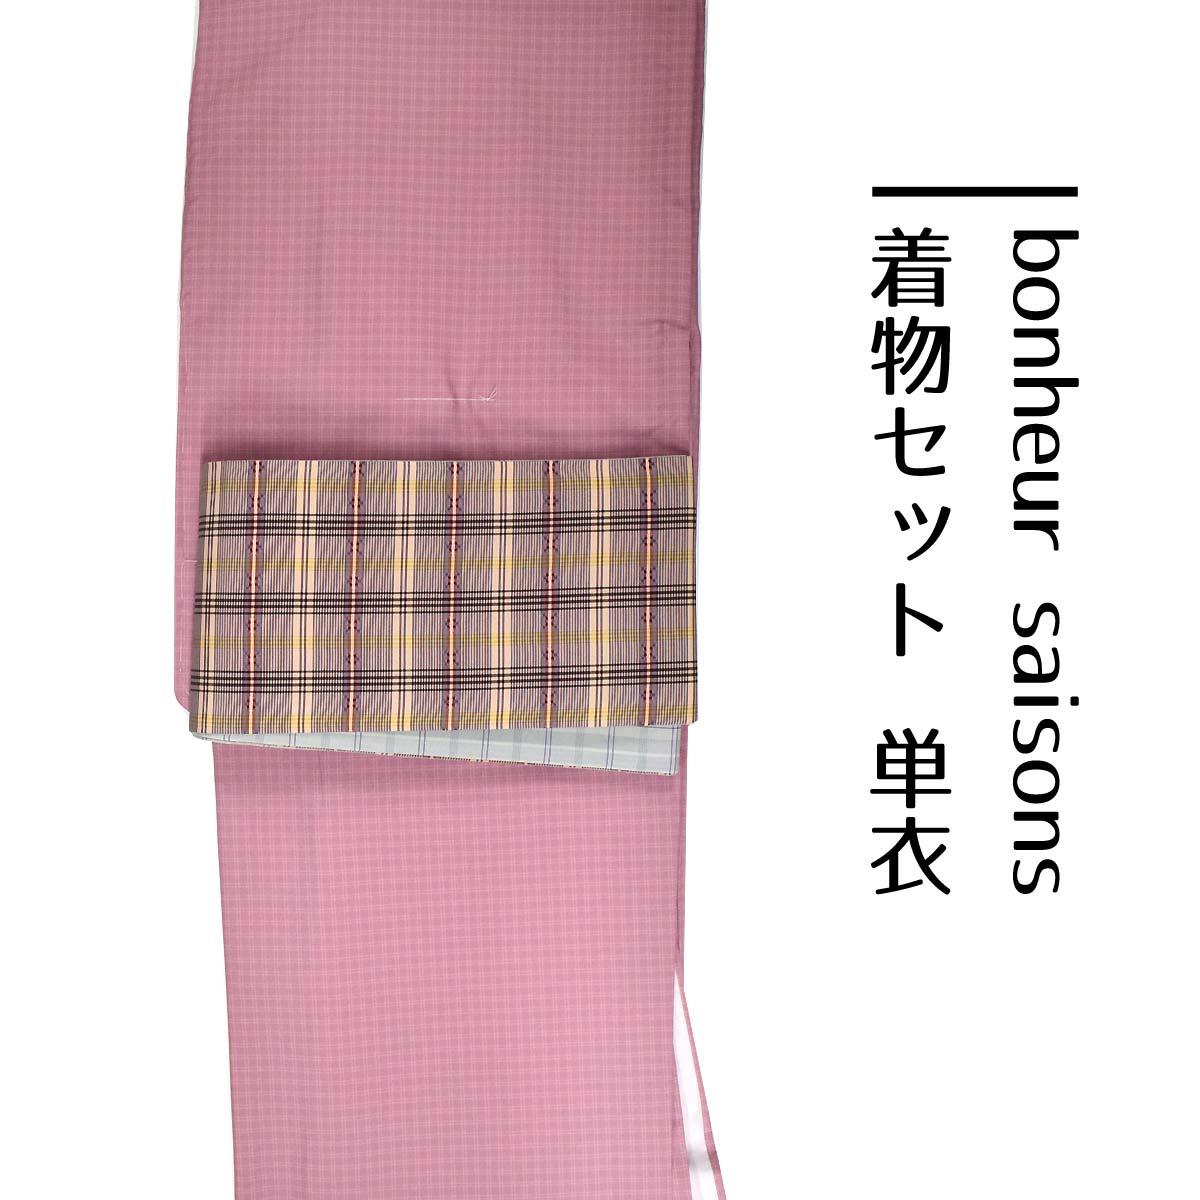 【L寸】【 単衣 】【 bonheur saison 】洗える着物 セット 洗える着物 + 洗える 細帯番号d604-252【h805】